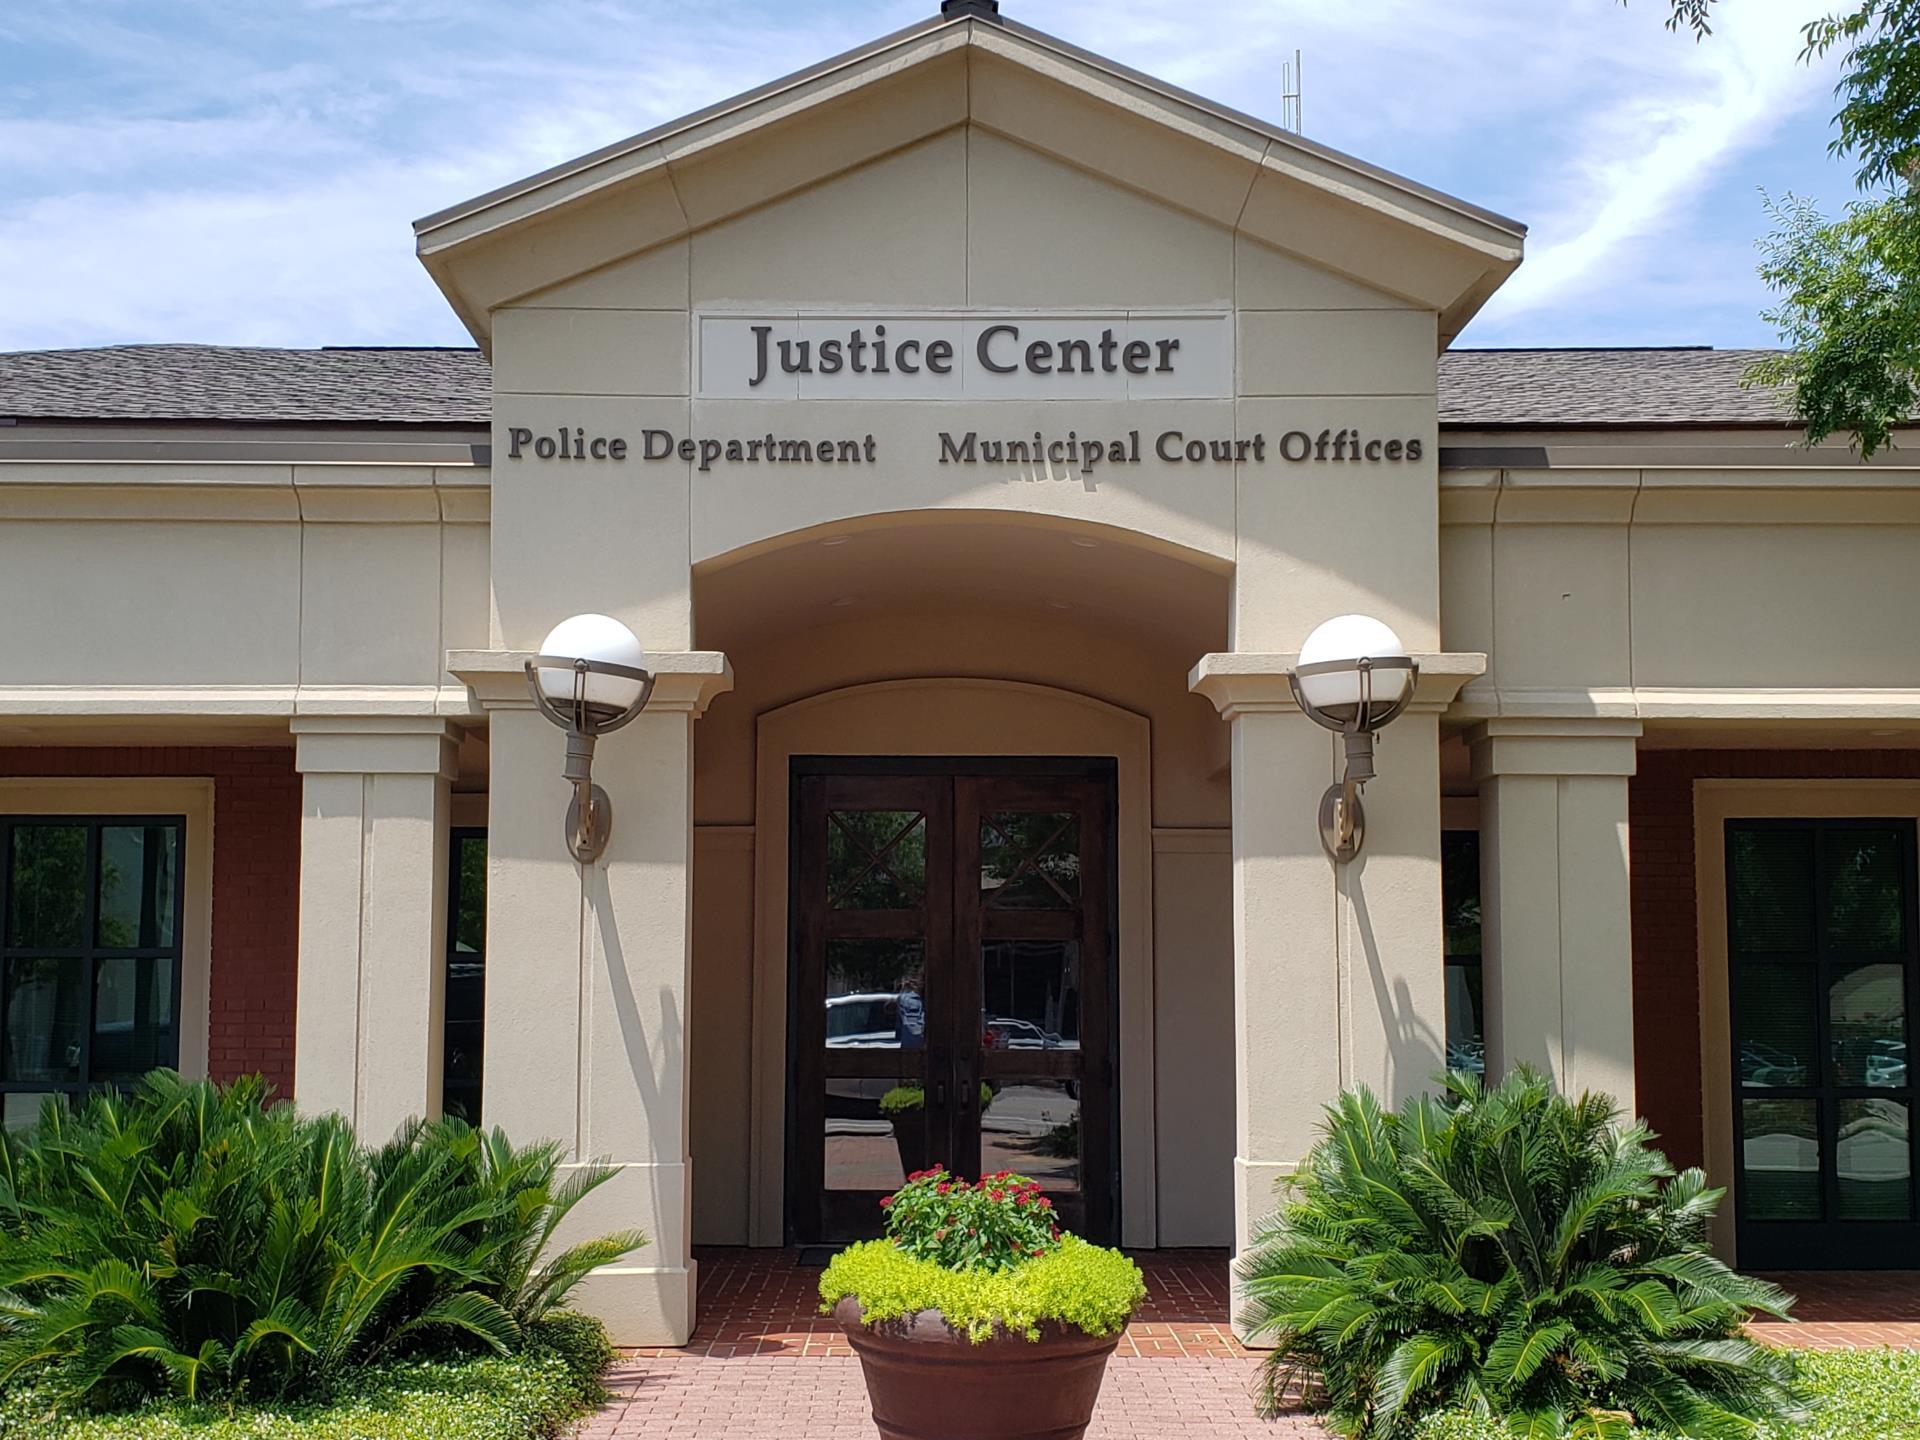 City of Fairhope Municipal Court | City of Fairhope, AL